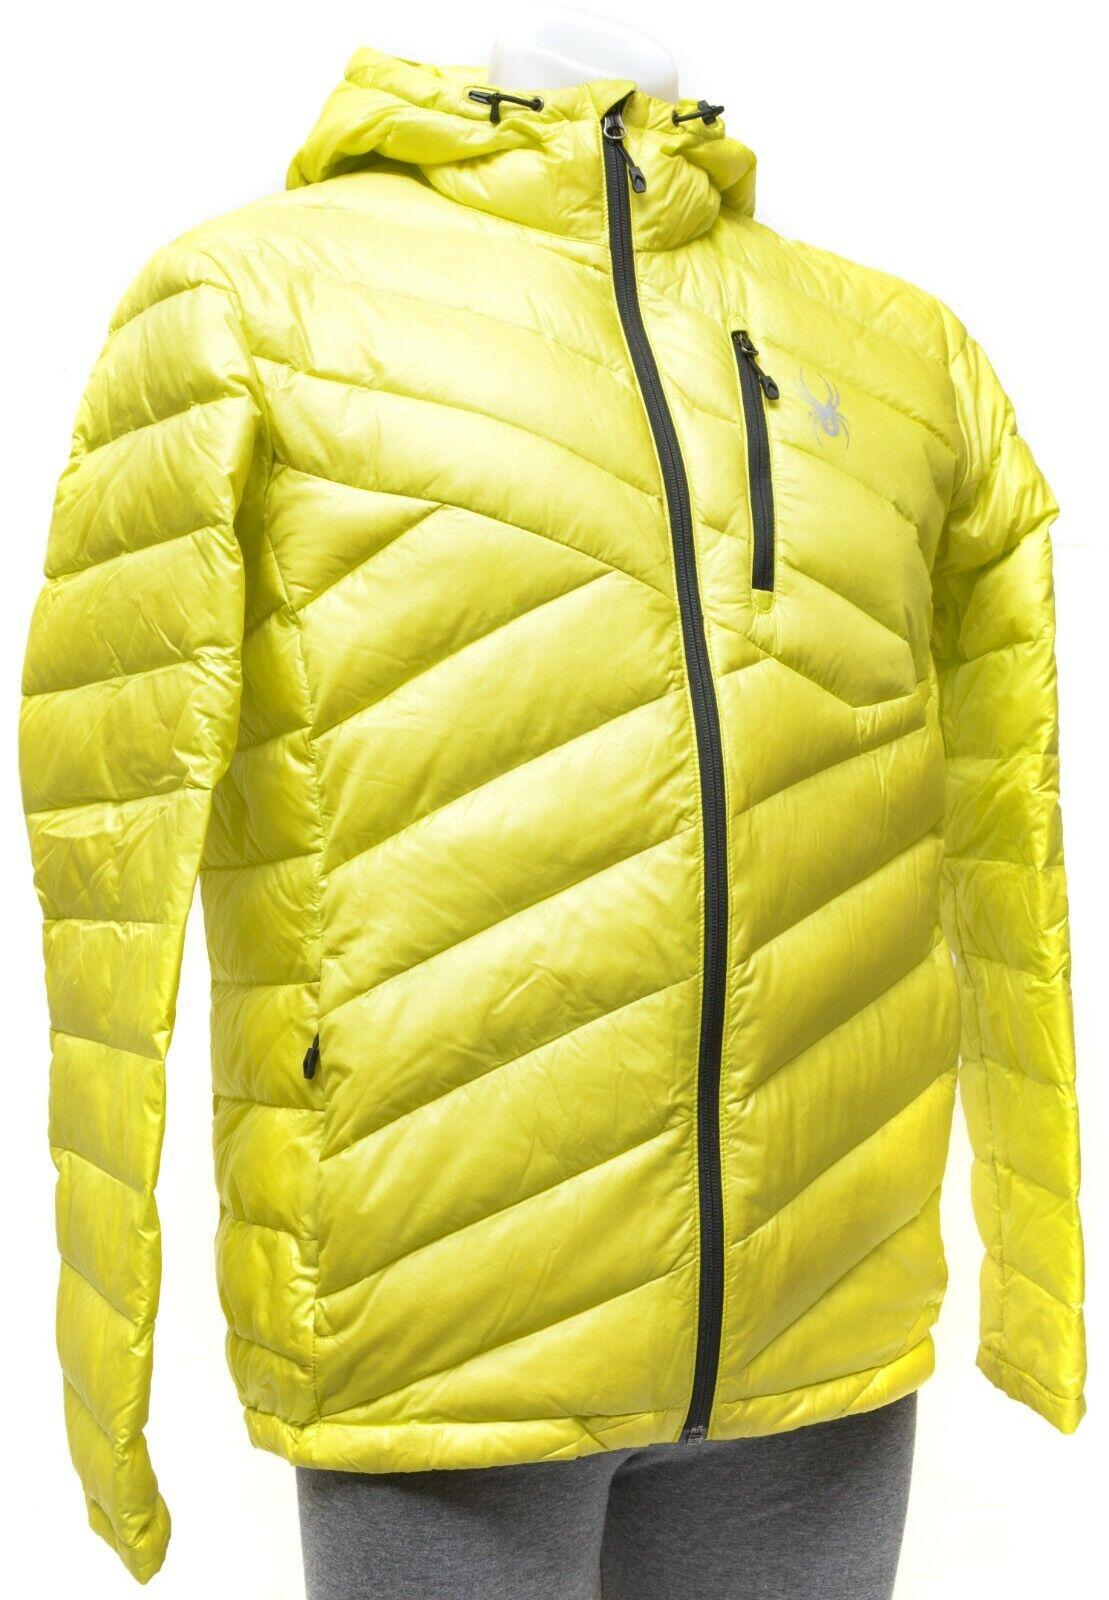 Spyder Syrround Hoody Down Jacket Men MEDIUM Acid Gelb Hood Puffy Jacket Coat